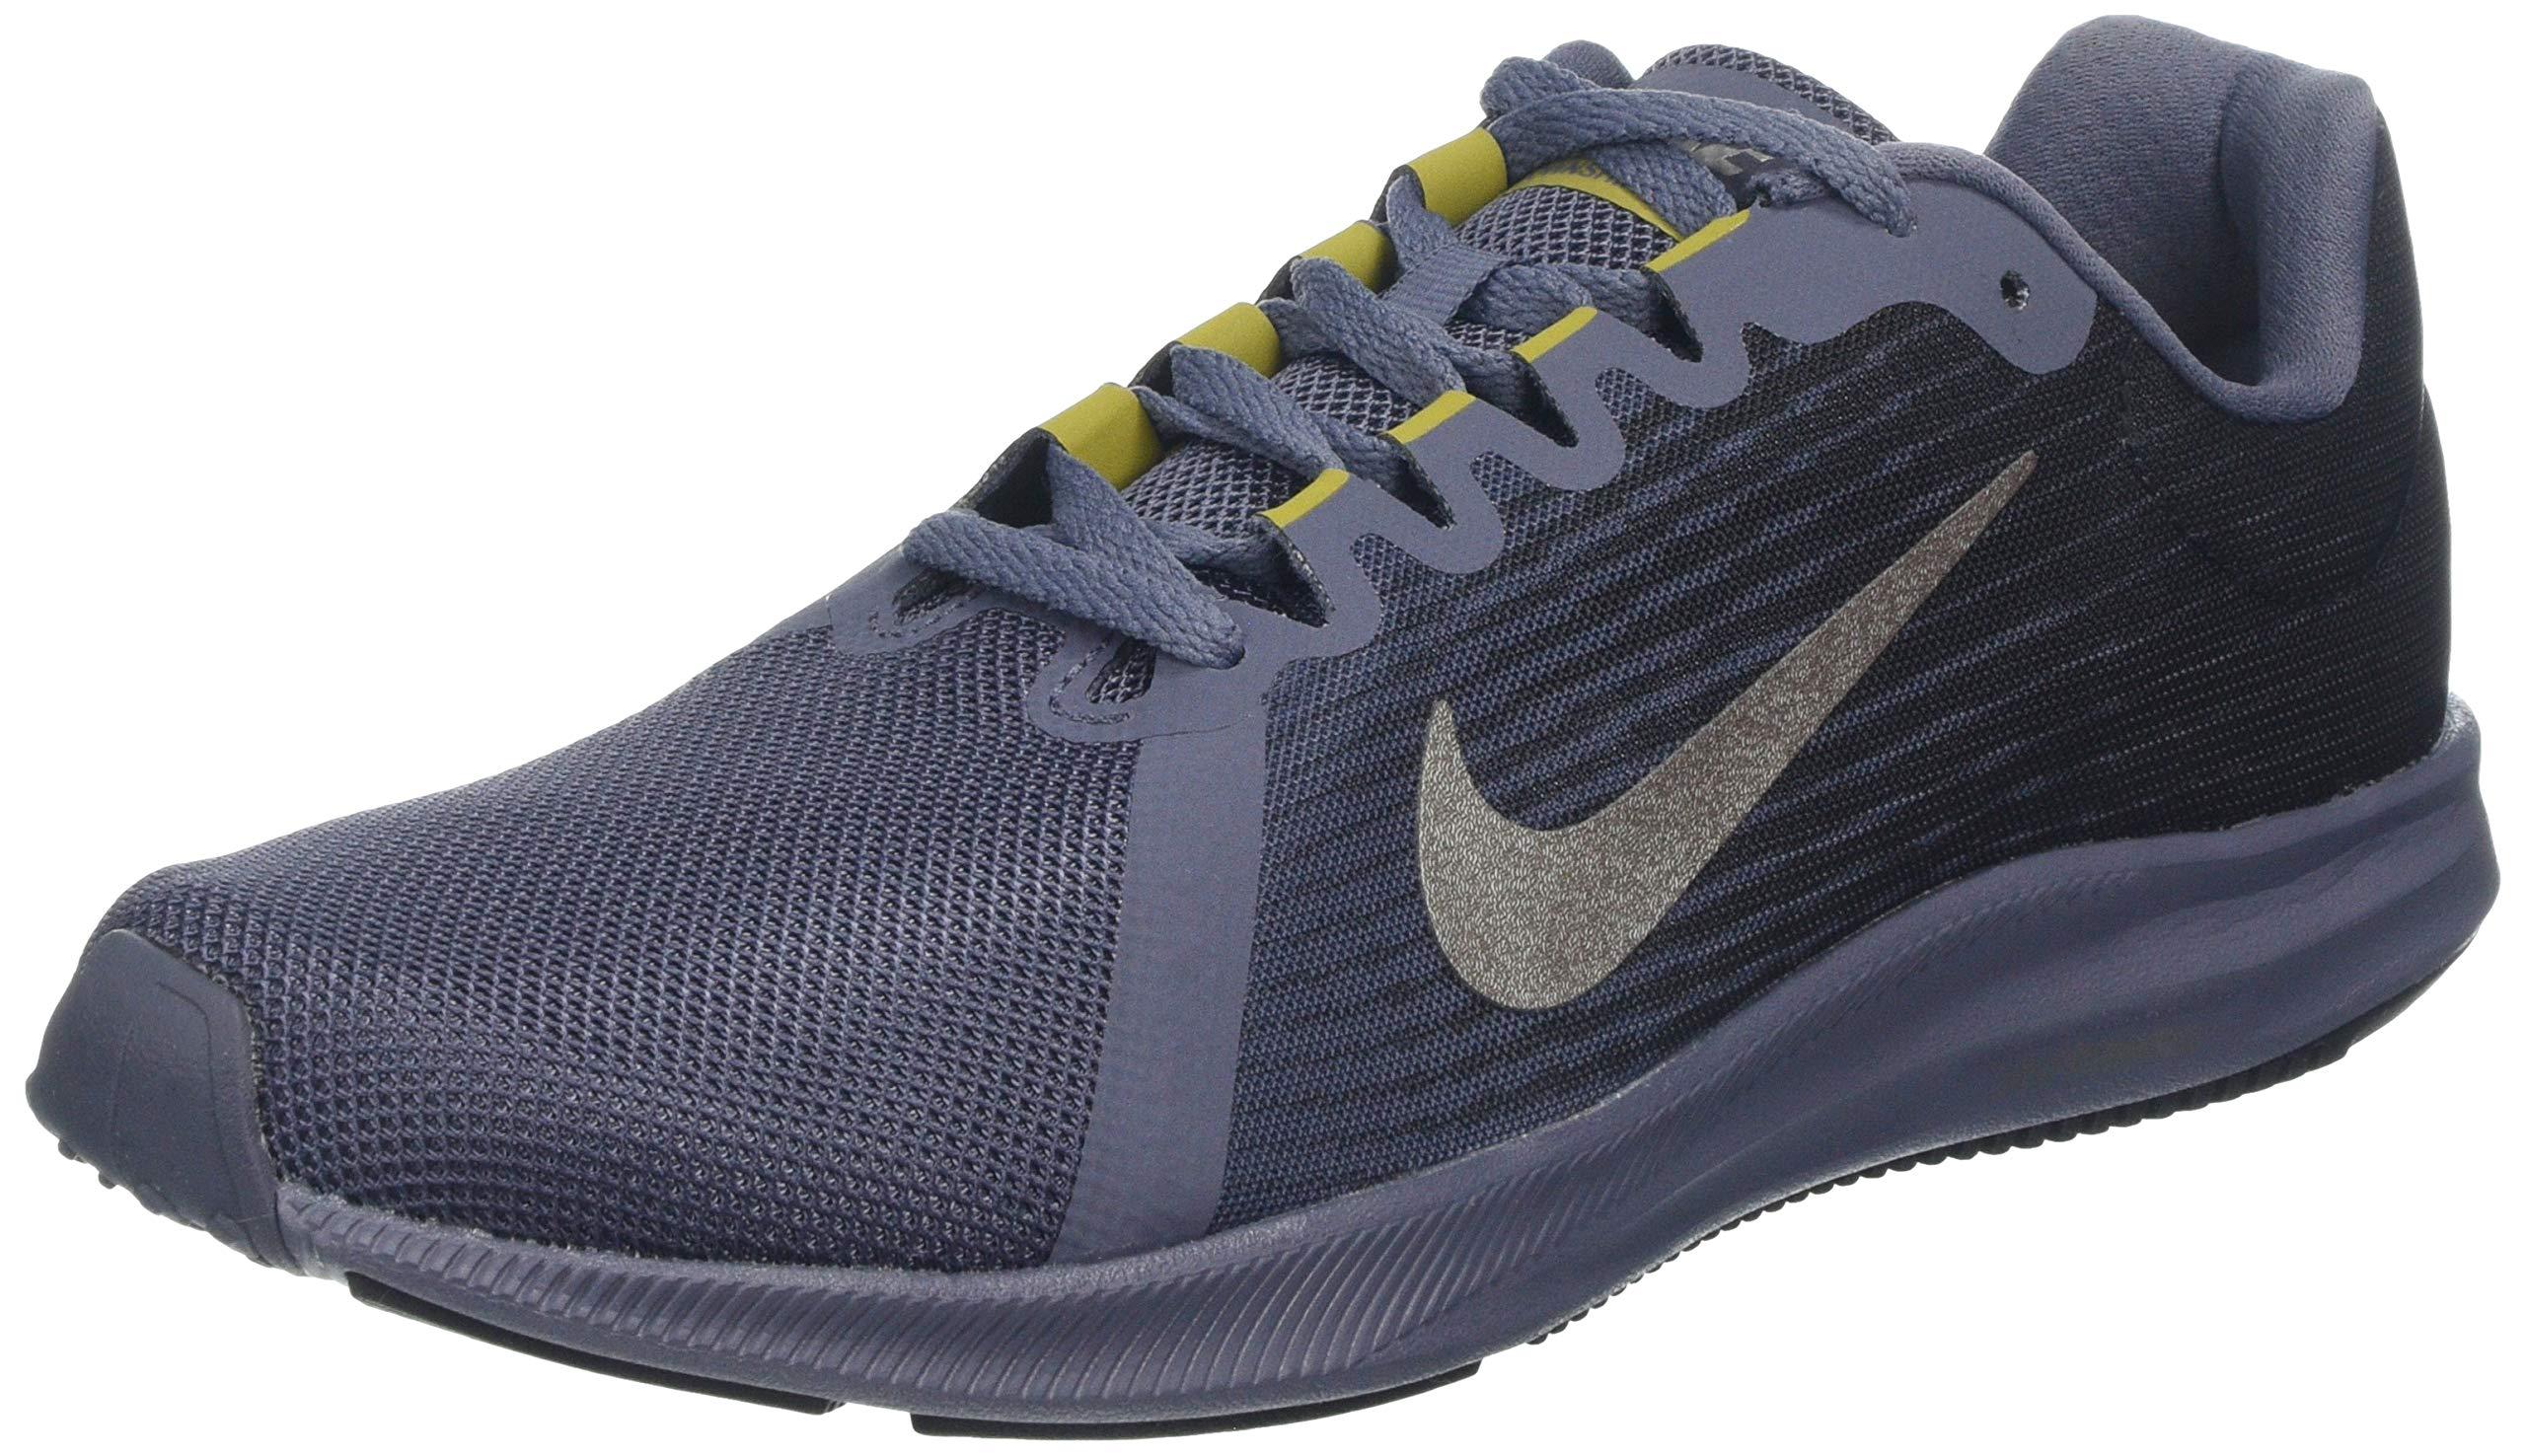 Nike Men's Downshifter 8 Running Shoe Light Carbon/Metallic Pewter/Peat Moss/Black Size 7.5 M US